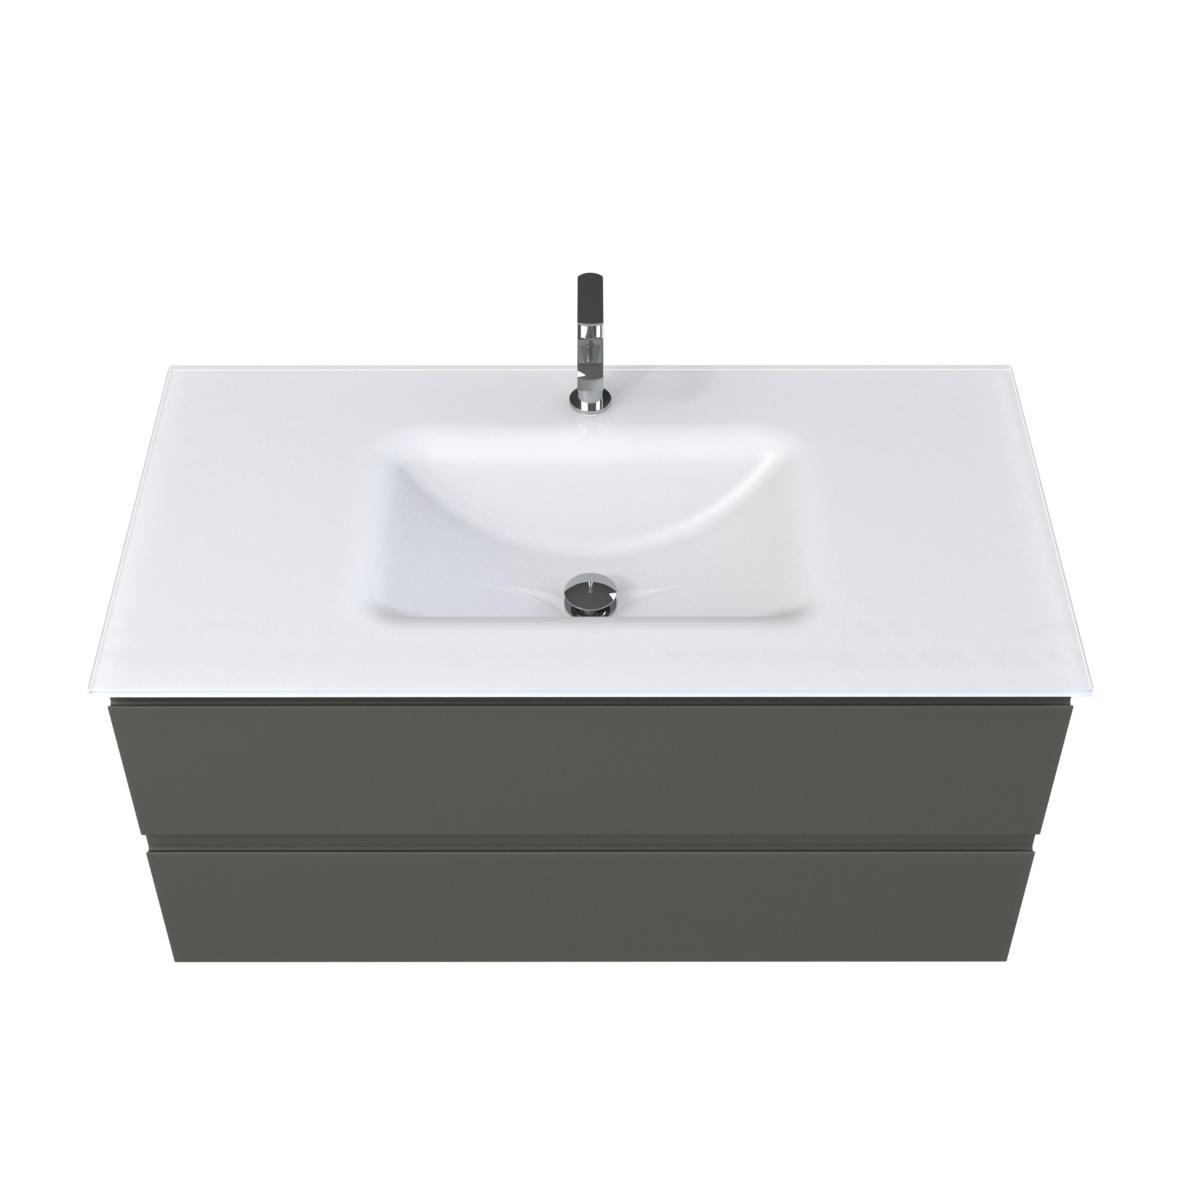 Plan vasque verre blanc sablé cedam